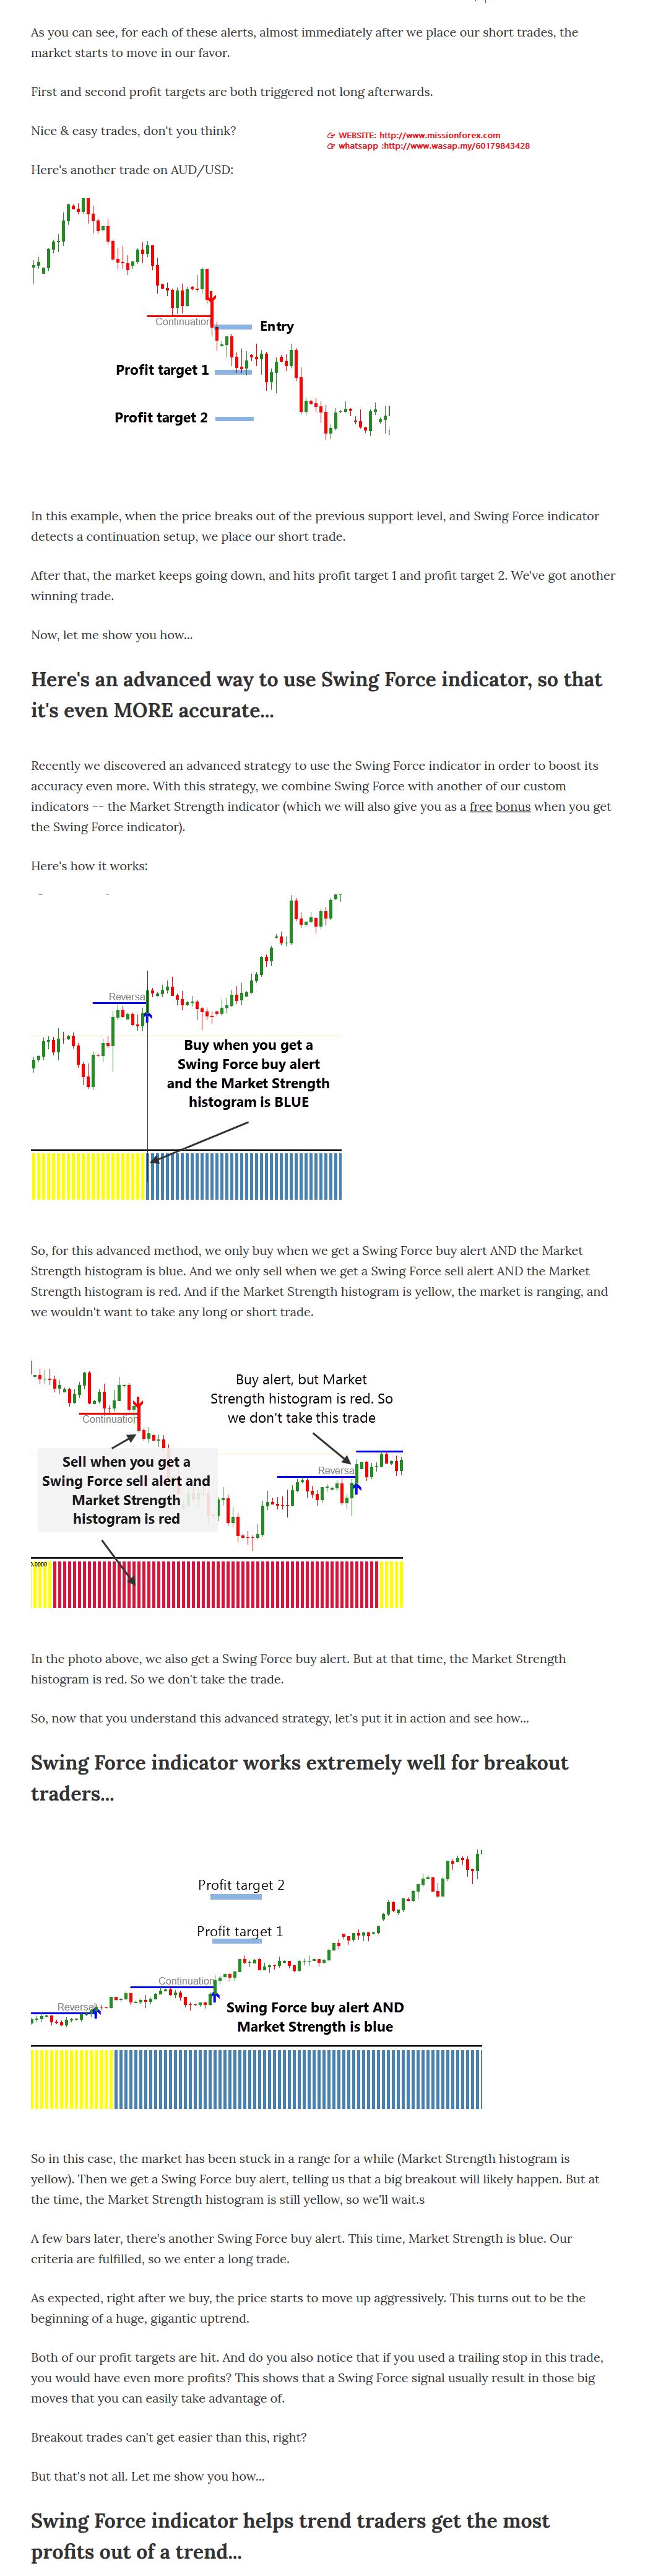 Swing-Trading-Dashboard-forex-Indicator-1